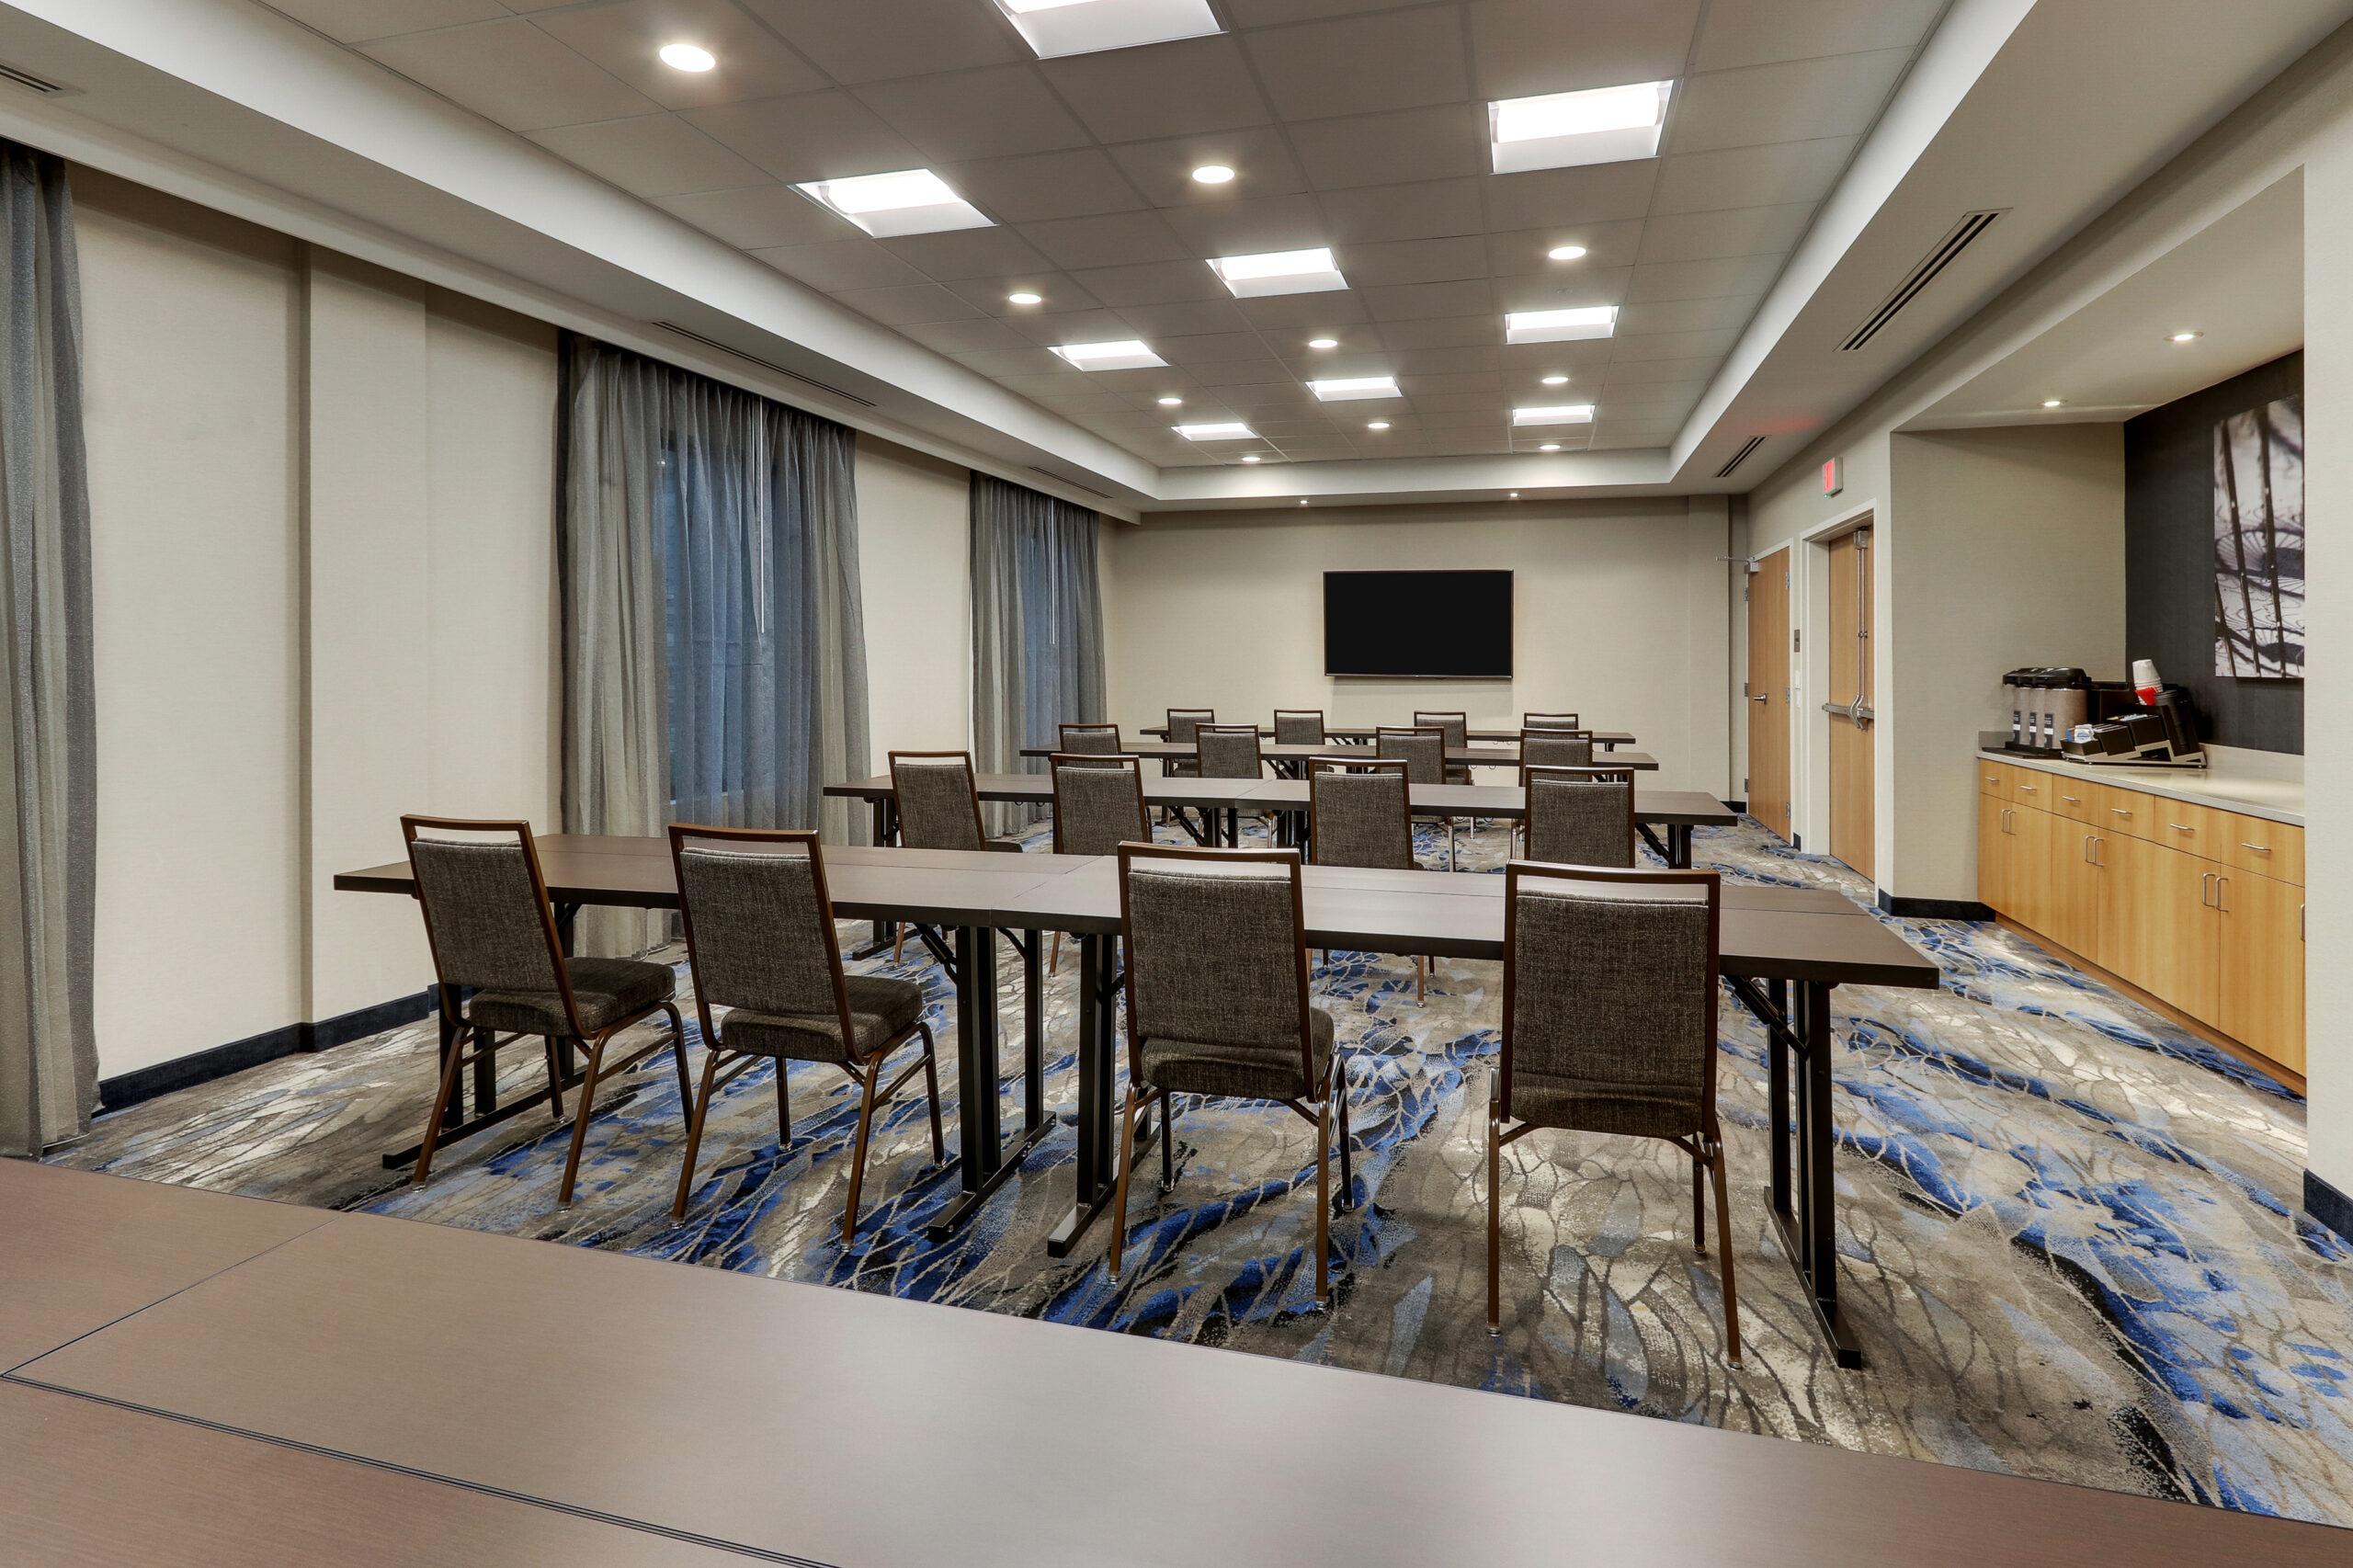 FF_AVLFW_Meeting Room 01